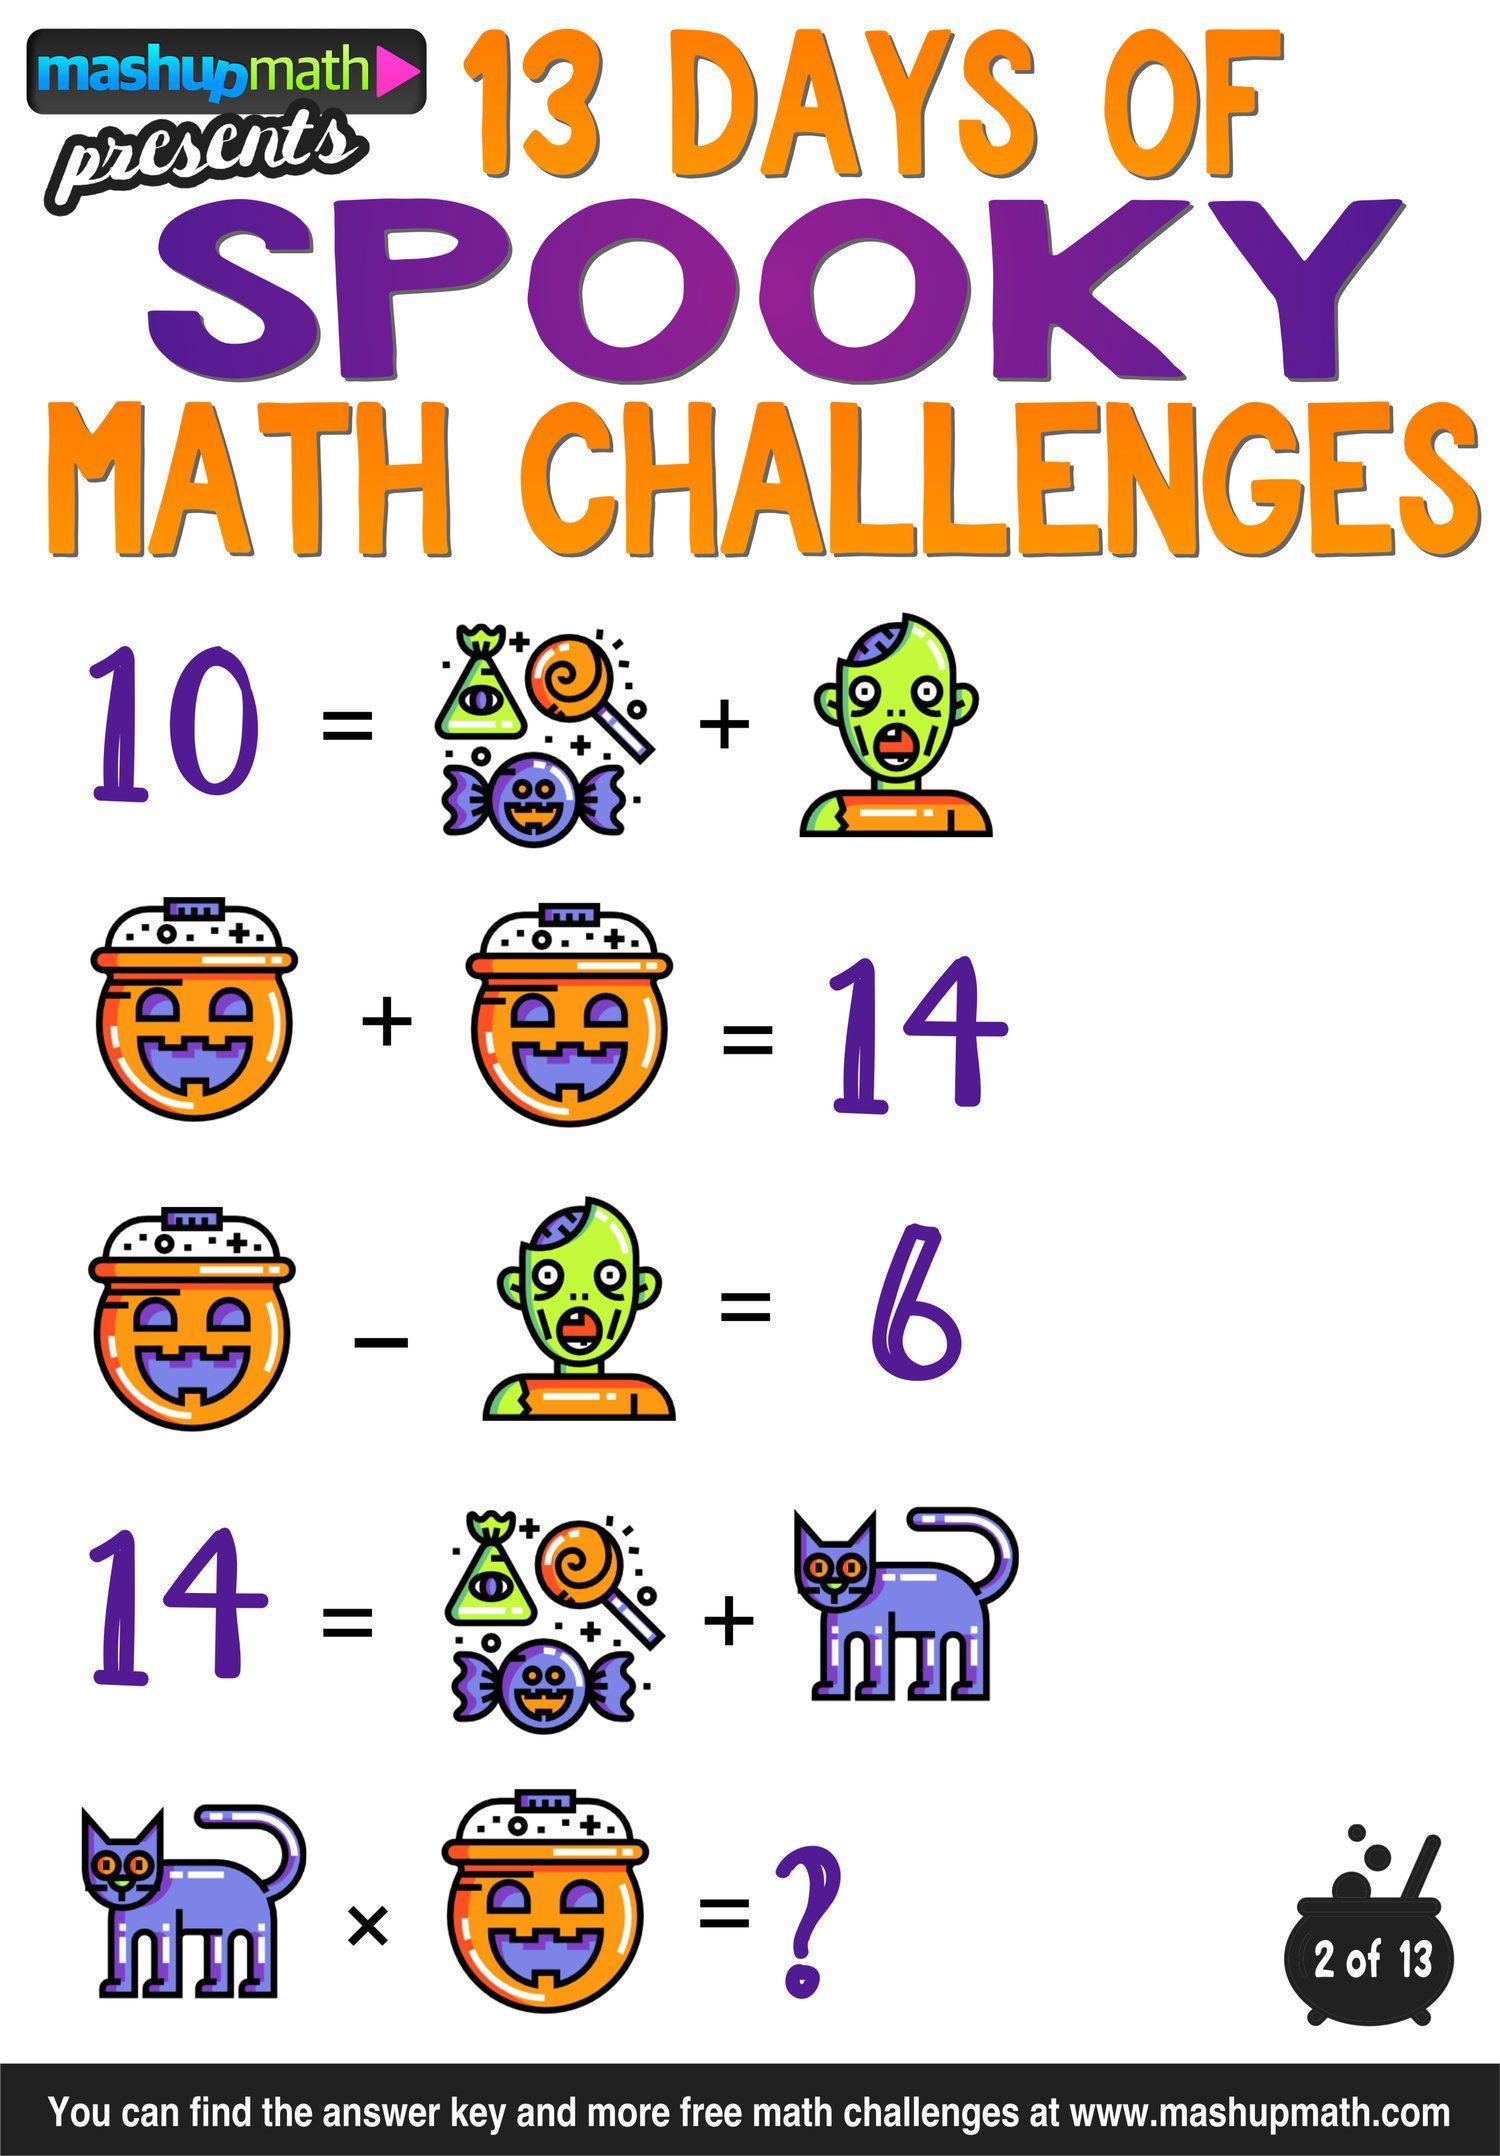 Halloween Math 13 Days Of Spooky Math Challenges For Grades 1 8 Mashup Math Math Challenge Halloween Math Halloween Math Worksheets [ 2156 x 1500 Pixel ]